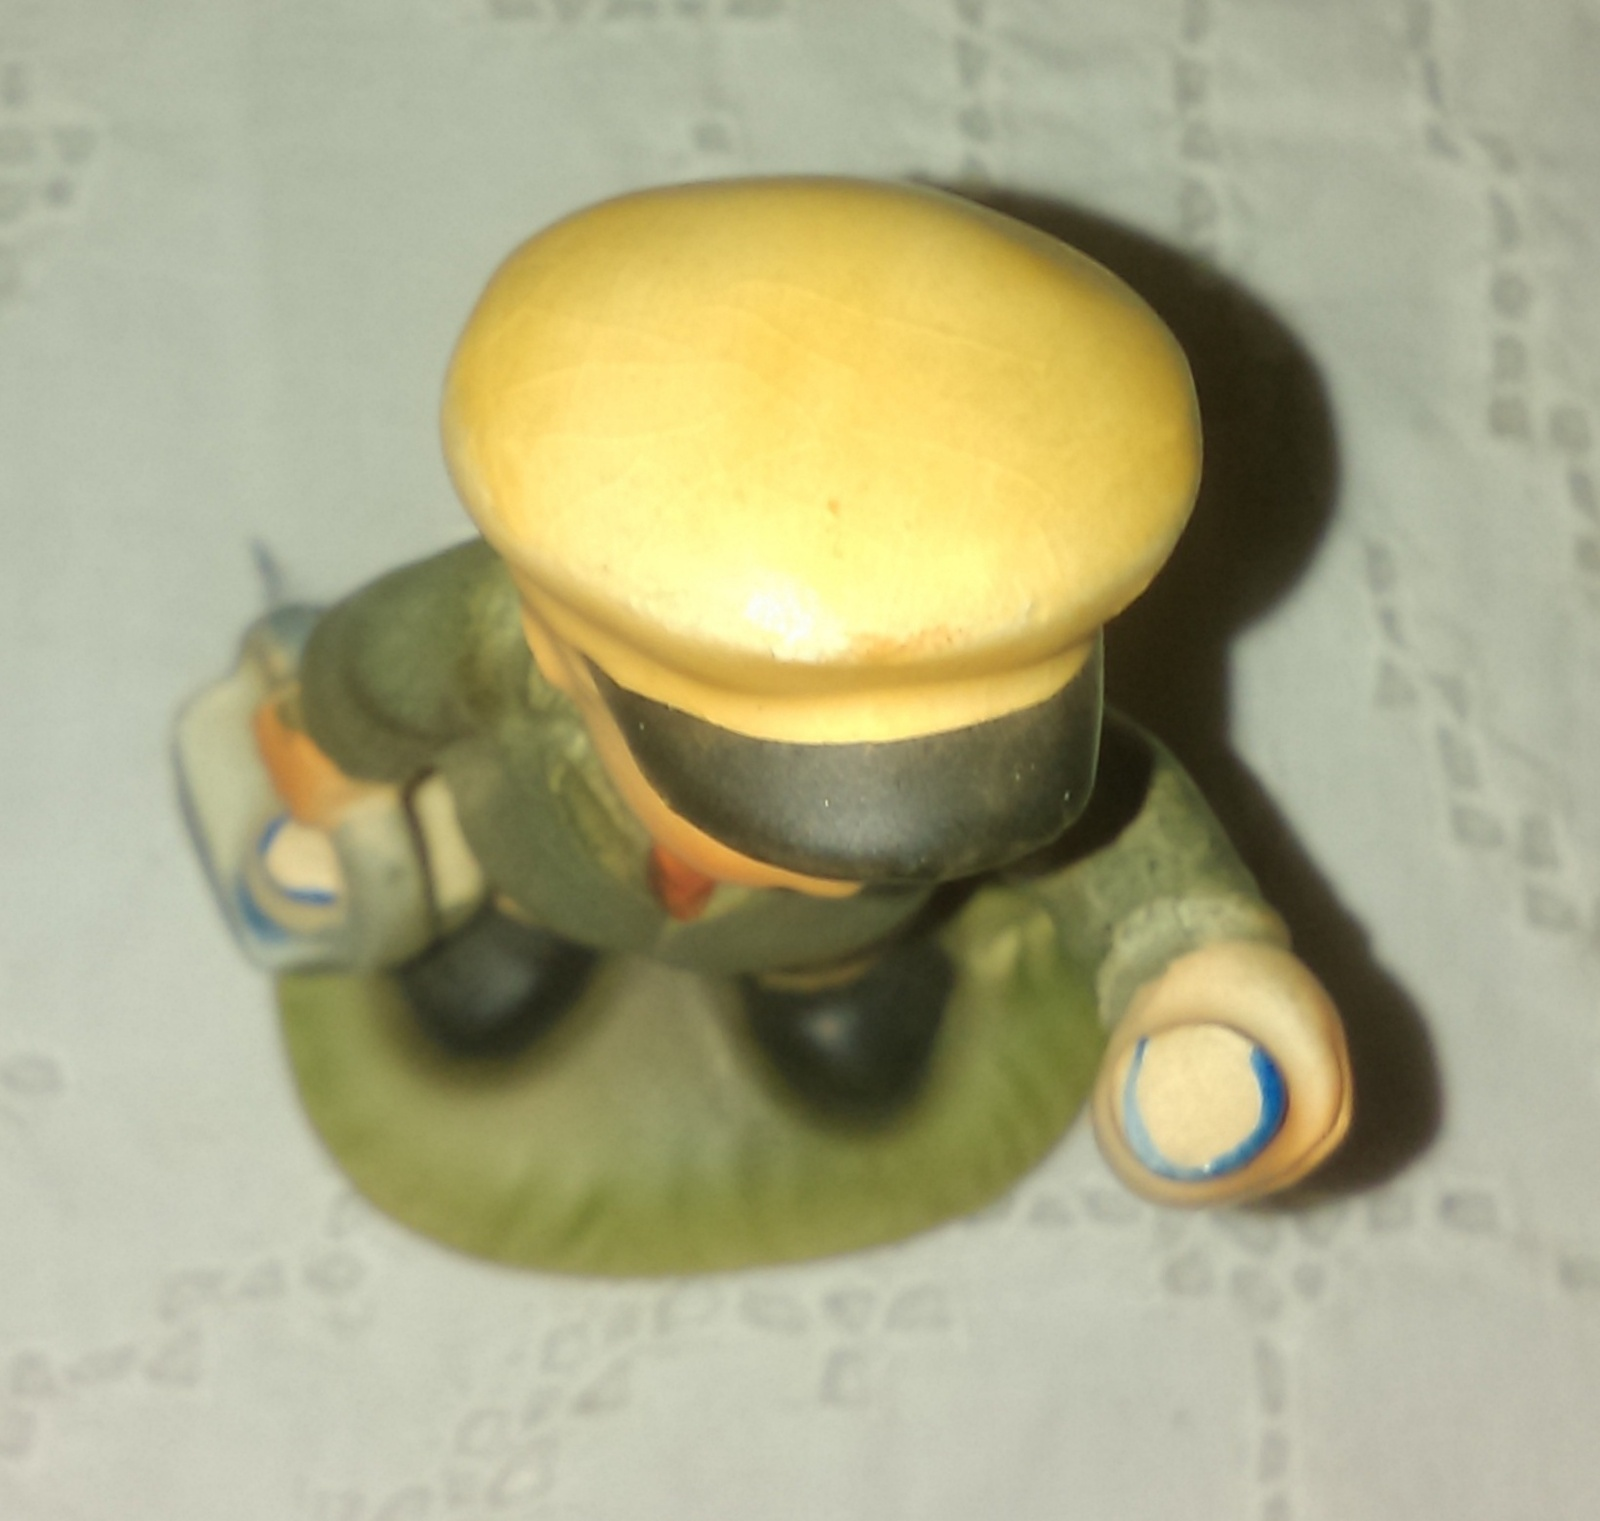 Napco Milk Delivery Boy Porcelain Figurine - No. C8811 - 1960